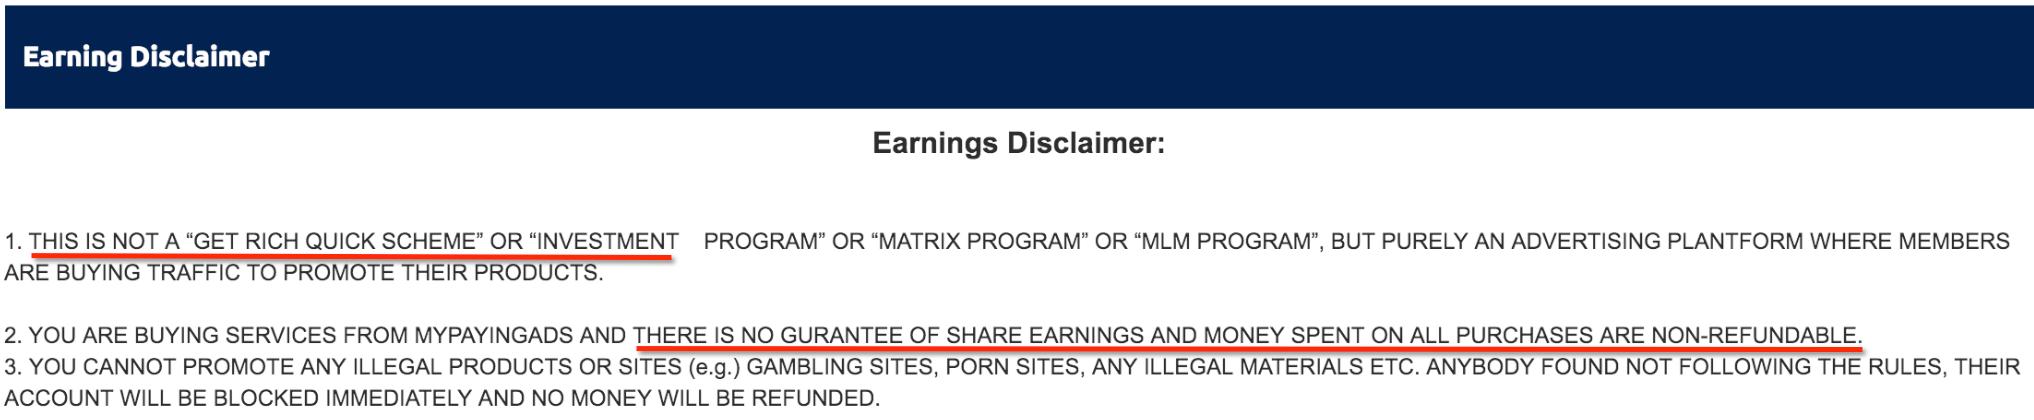 earning disclaimer